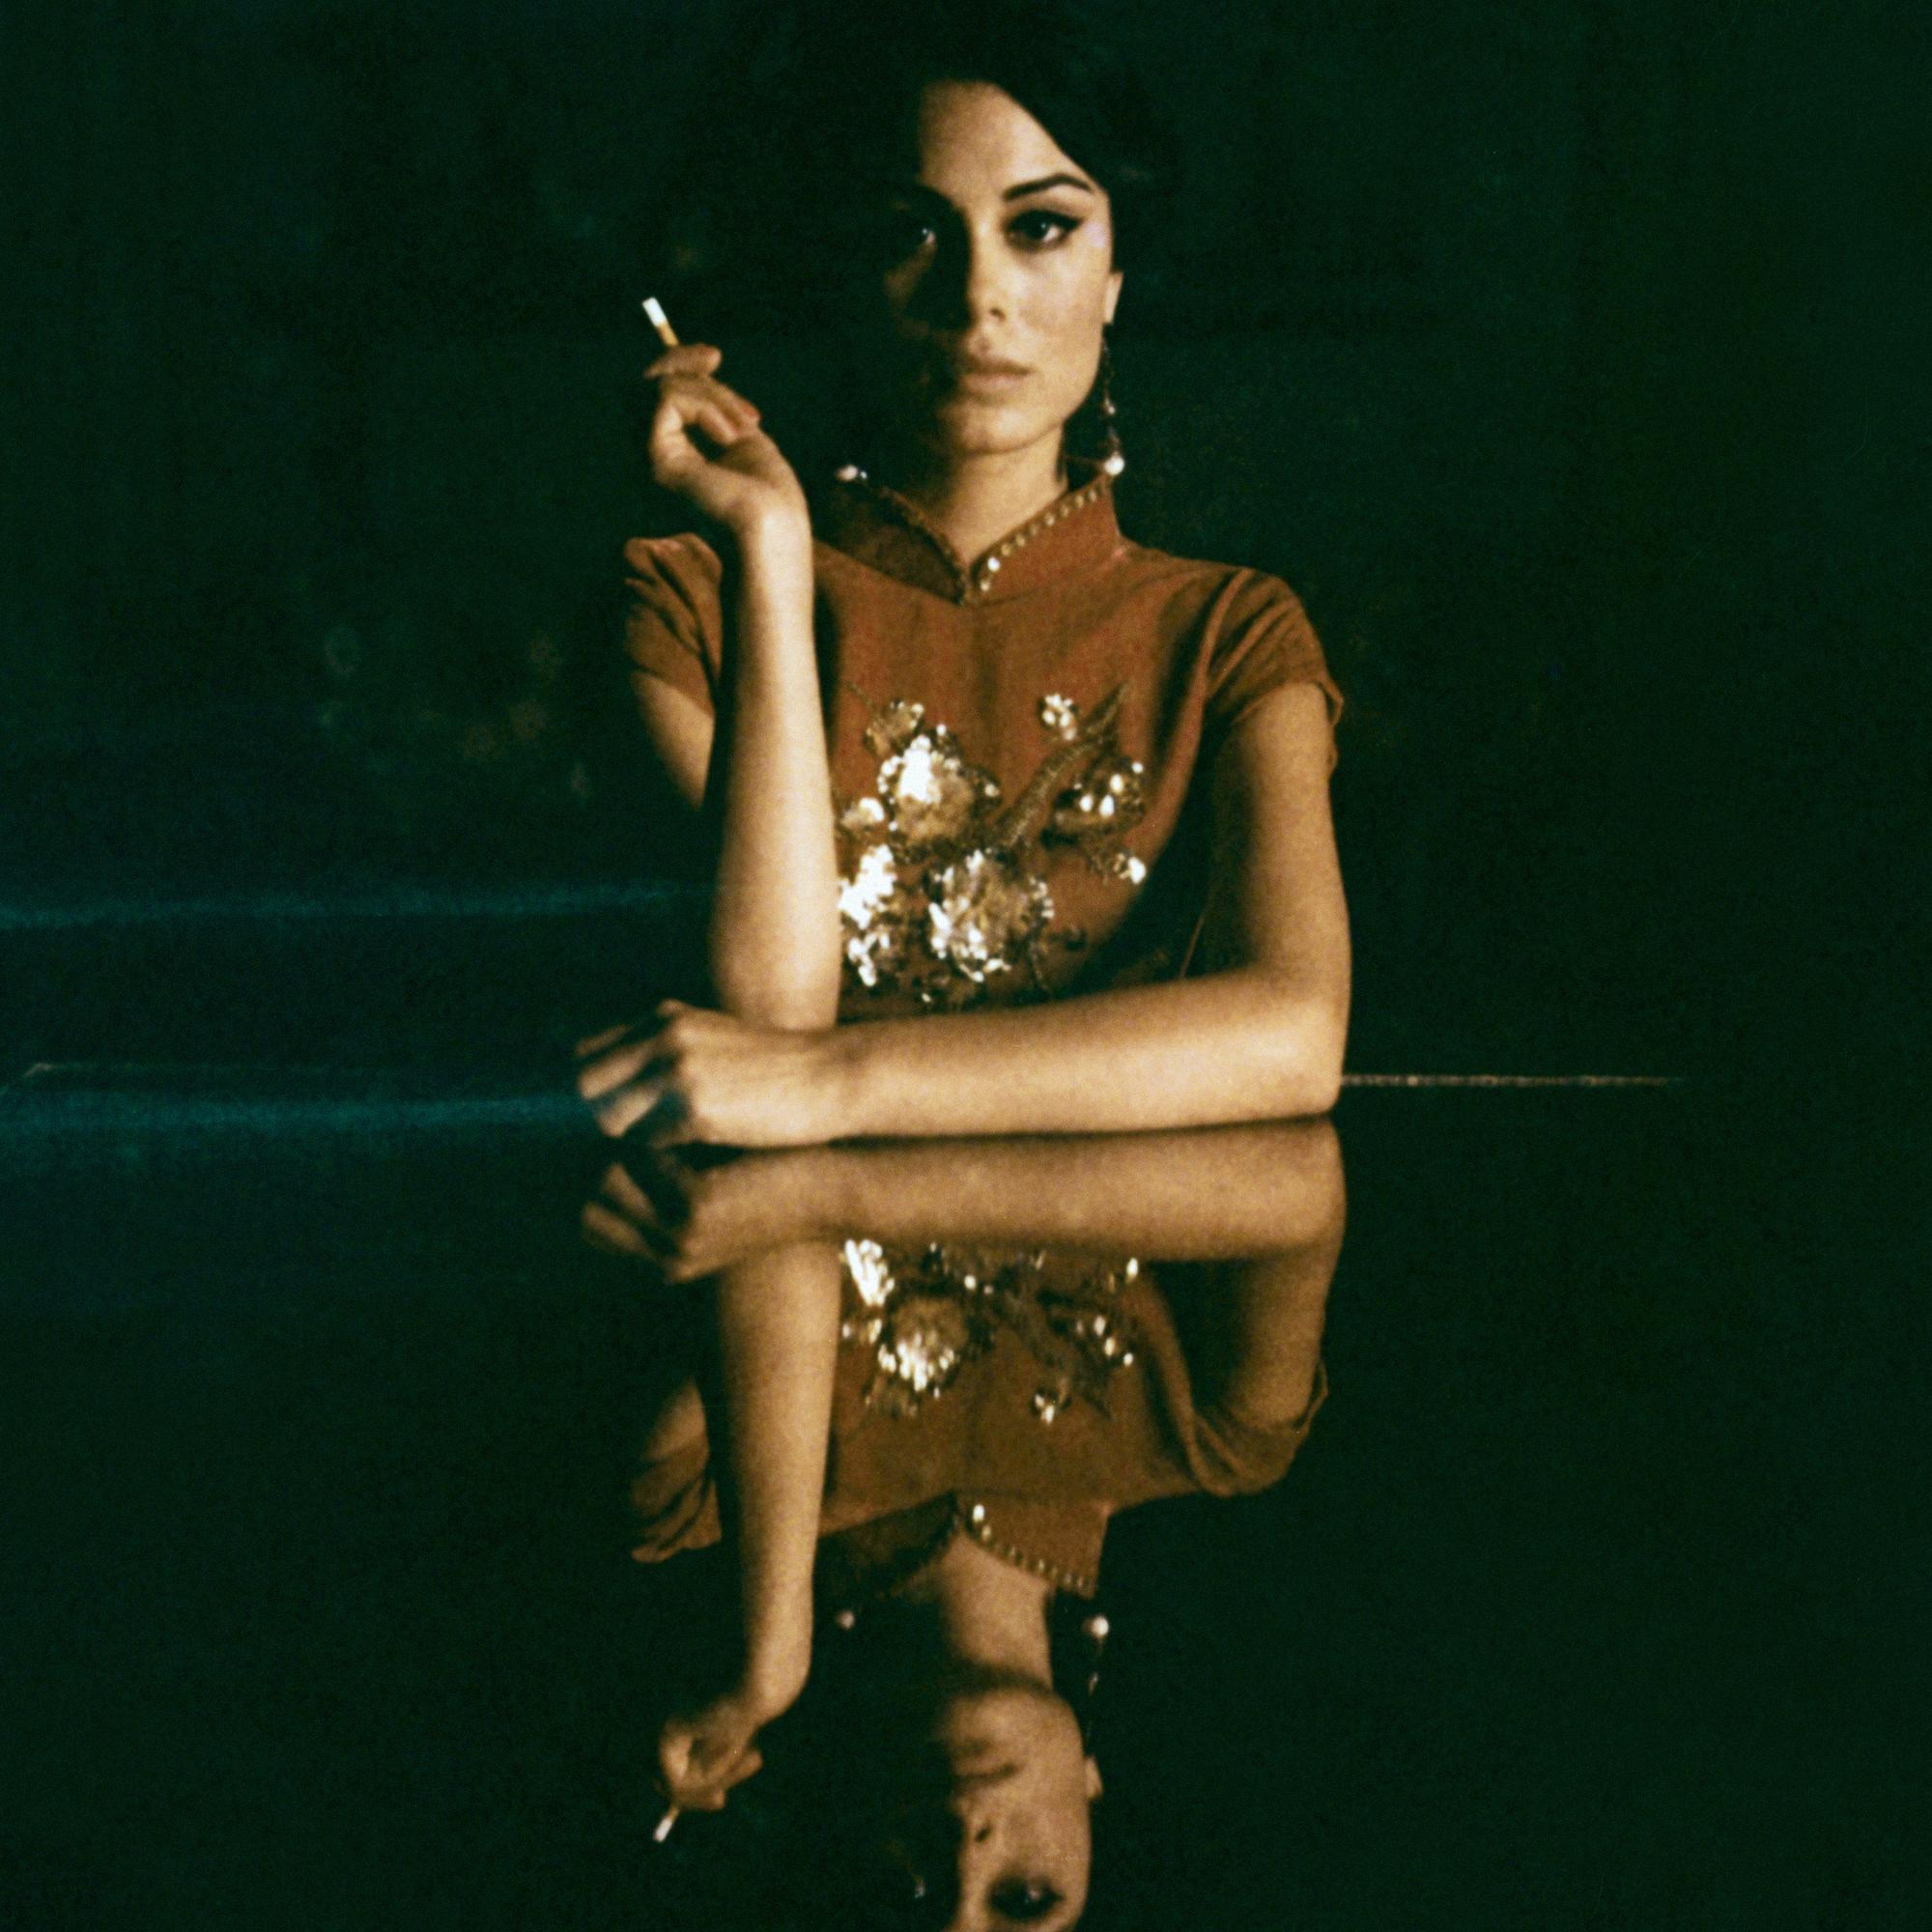 Nathalie Kelley - Neil Krug.jpg